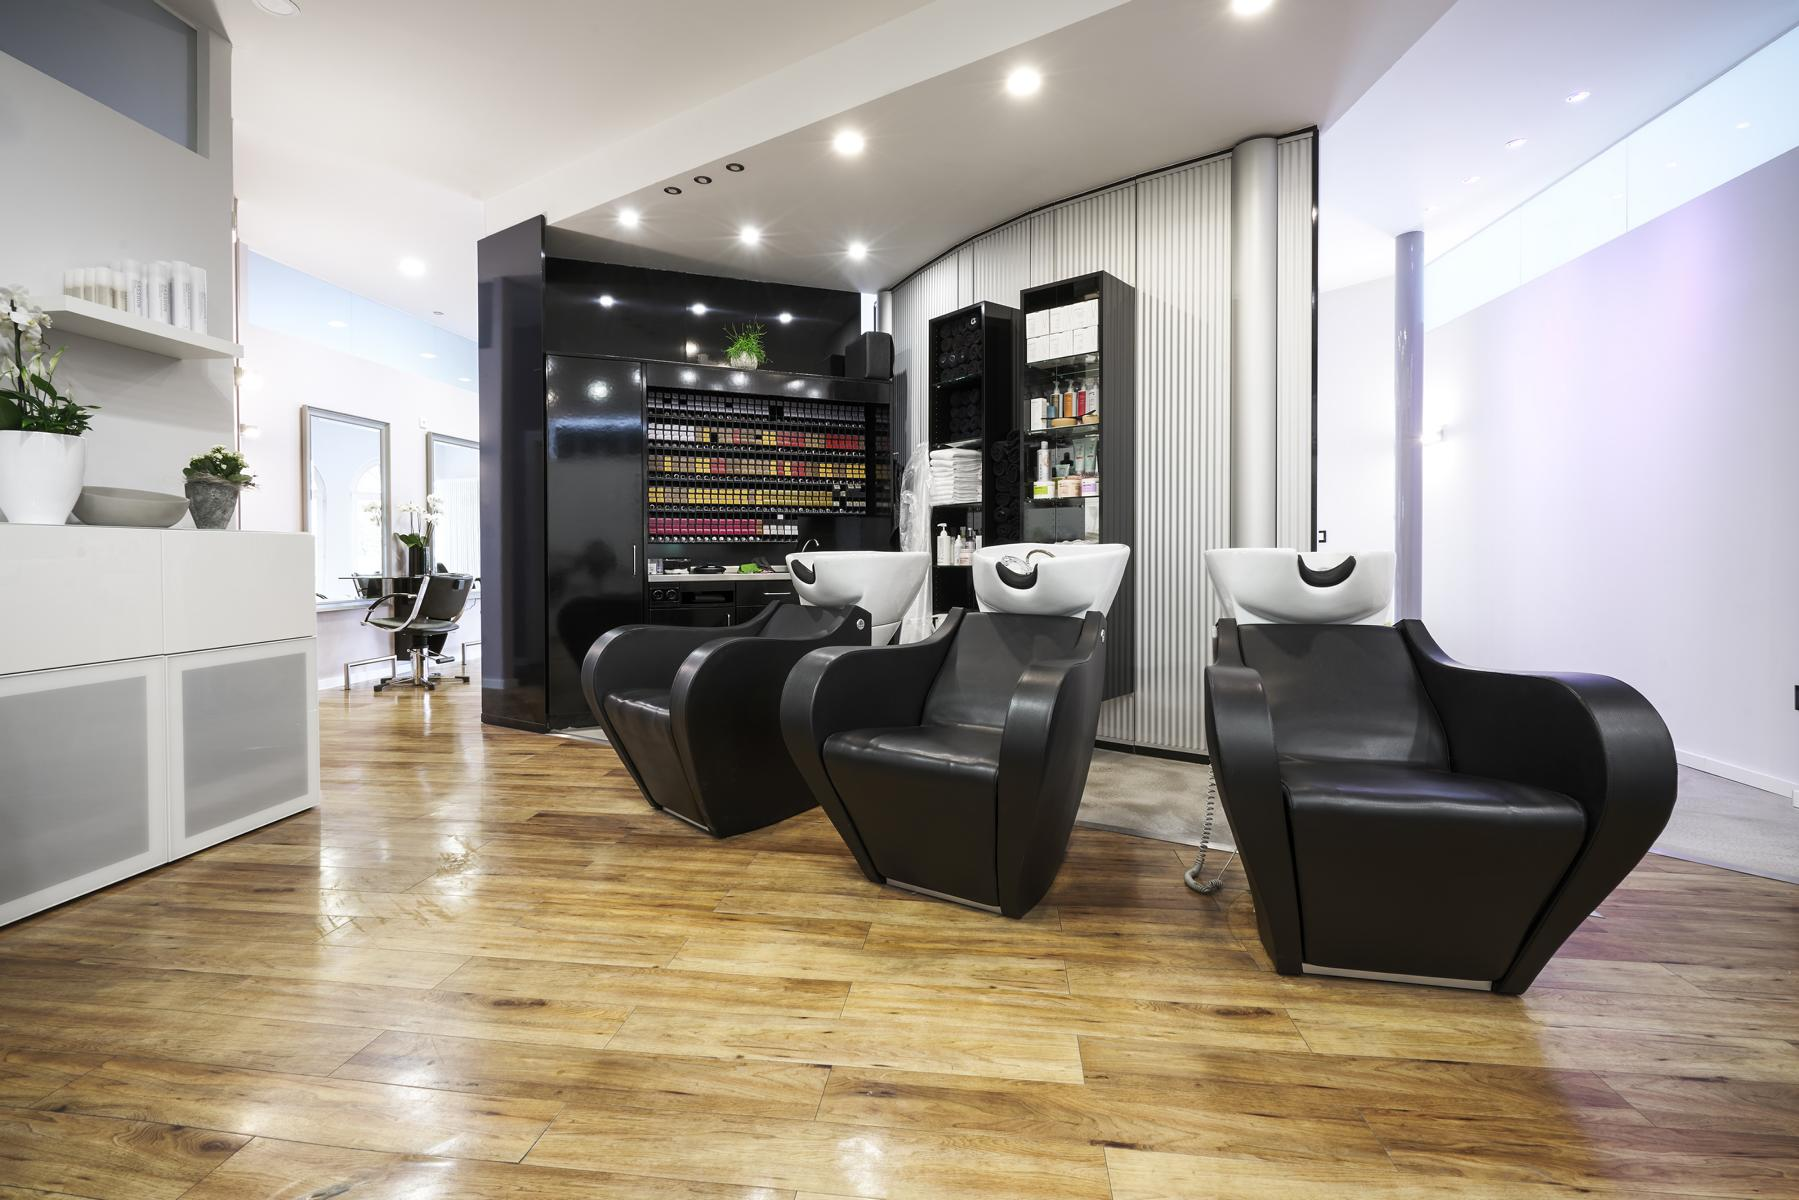 Salon Oeventrop wird geschlossen - Franco Falcone Hair Design